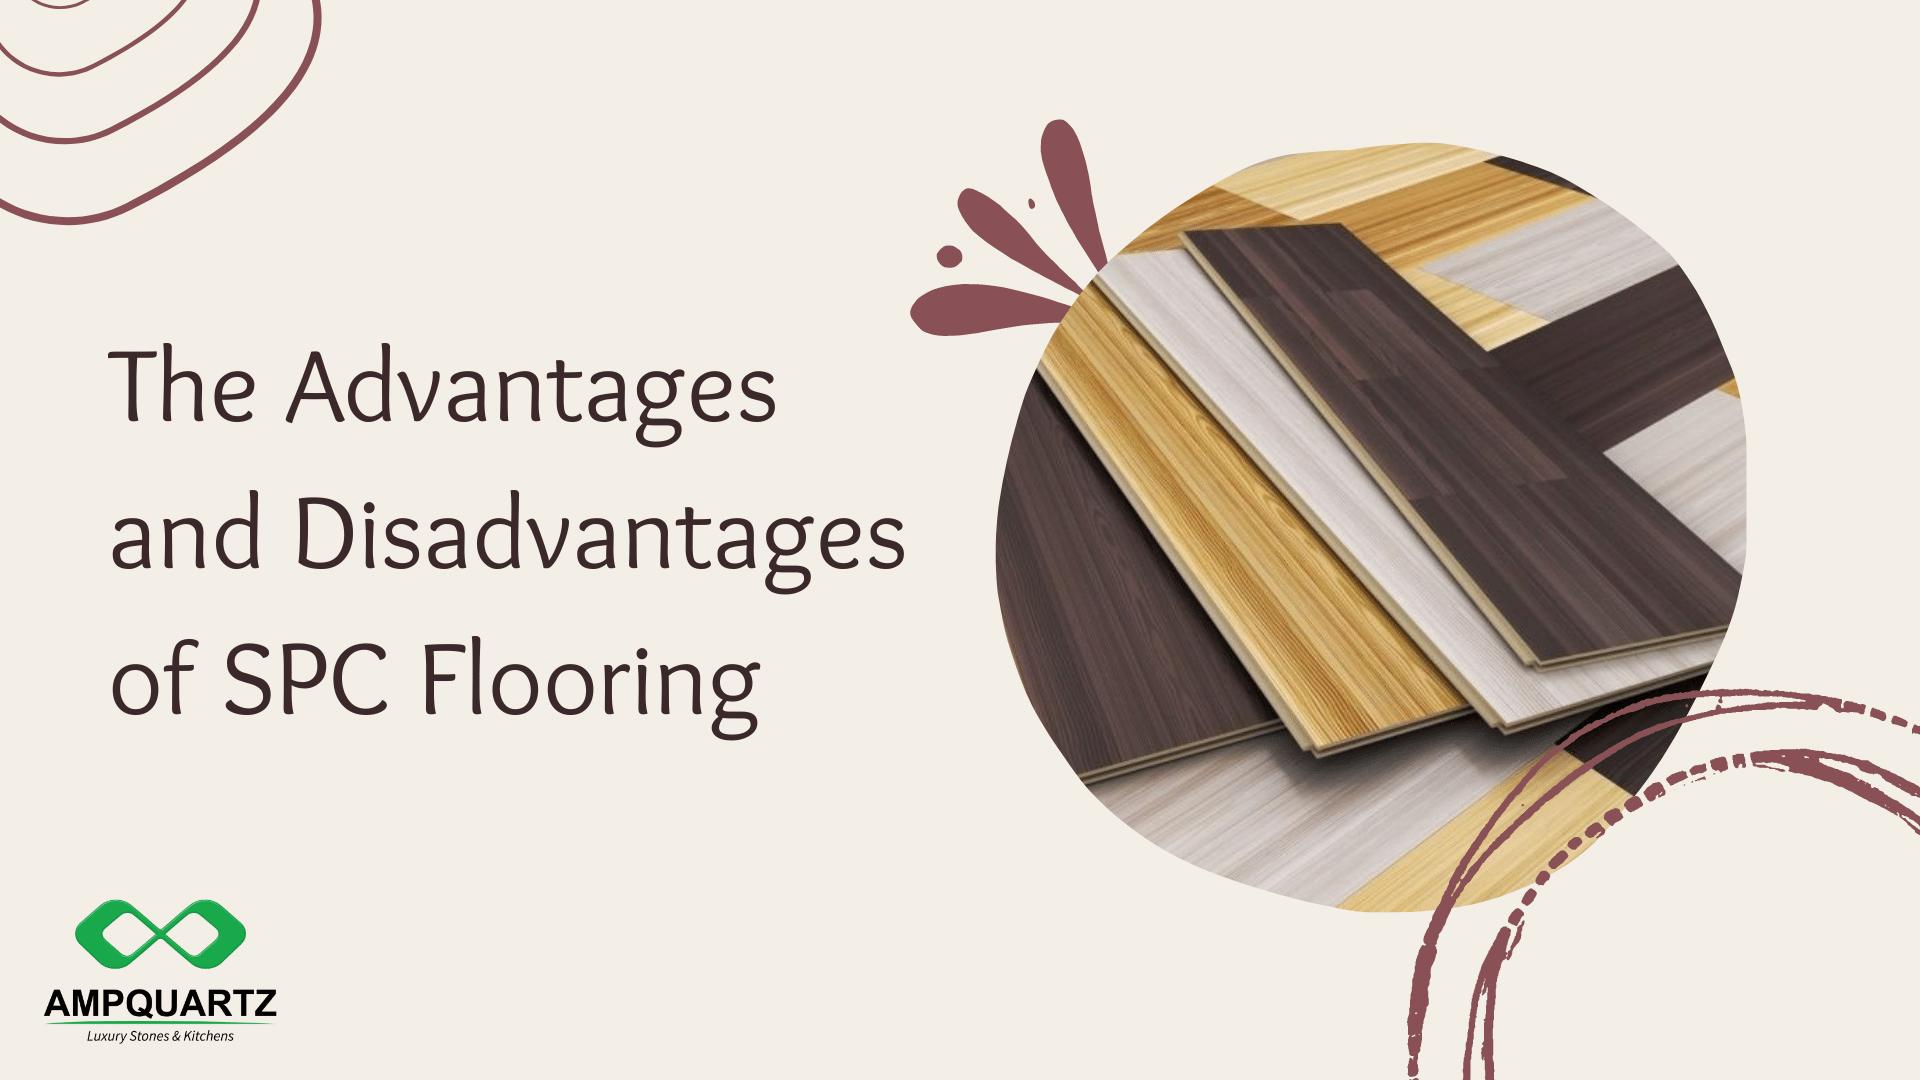 spc flooring, The Advantages and Disadvantages of SPC Flooring